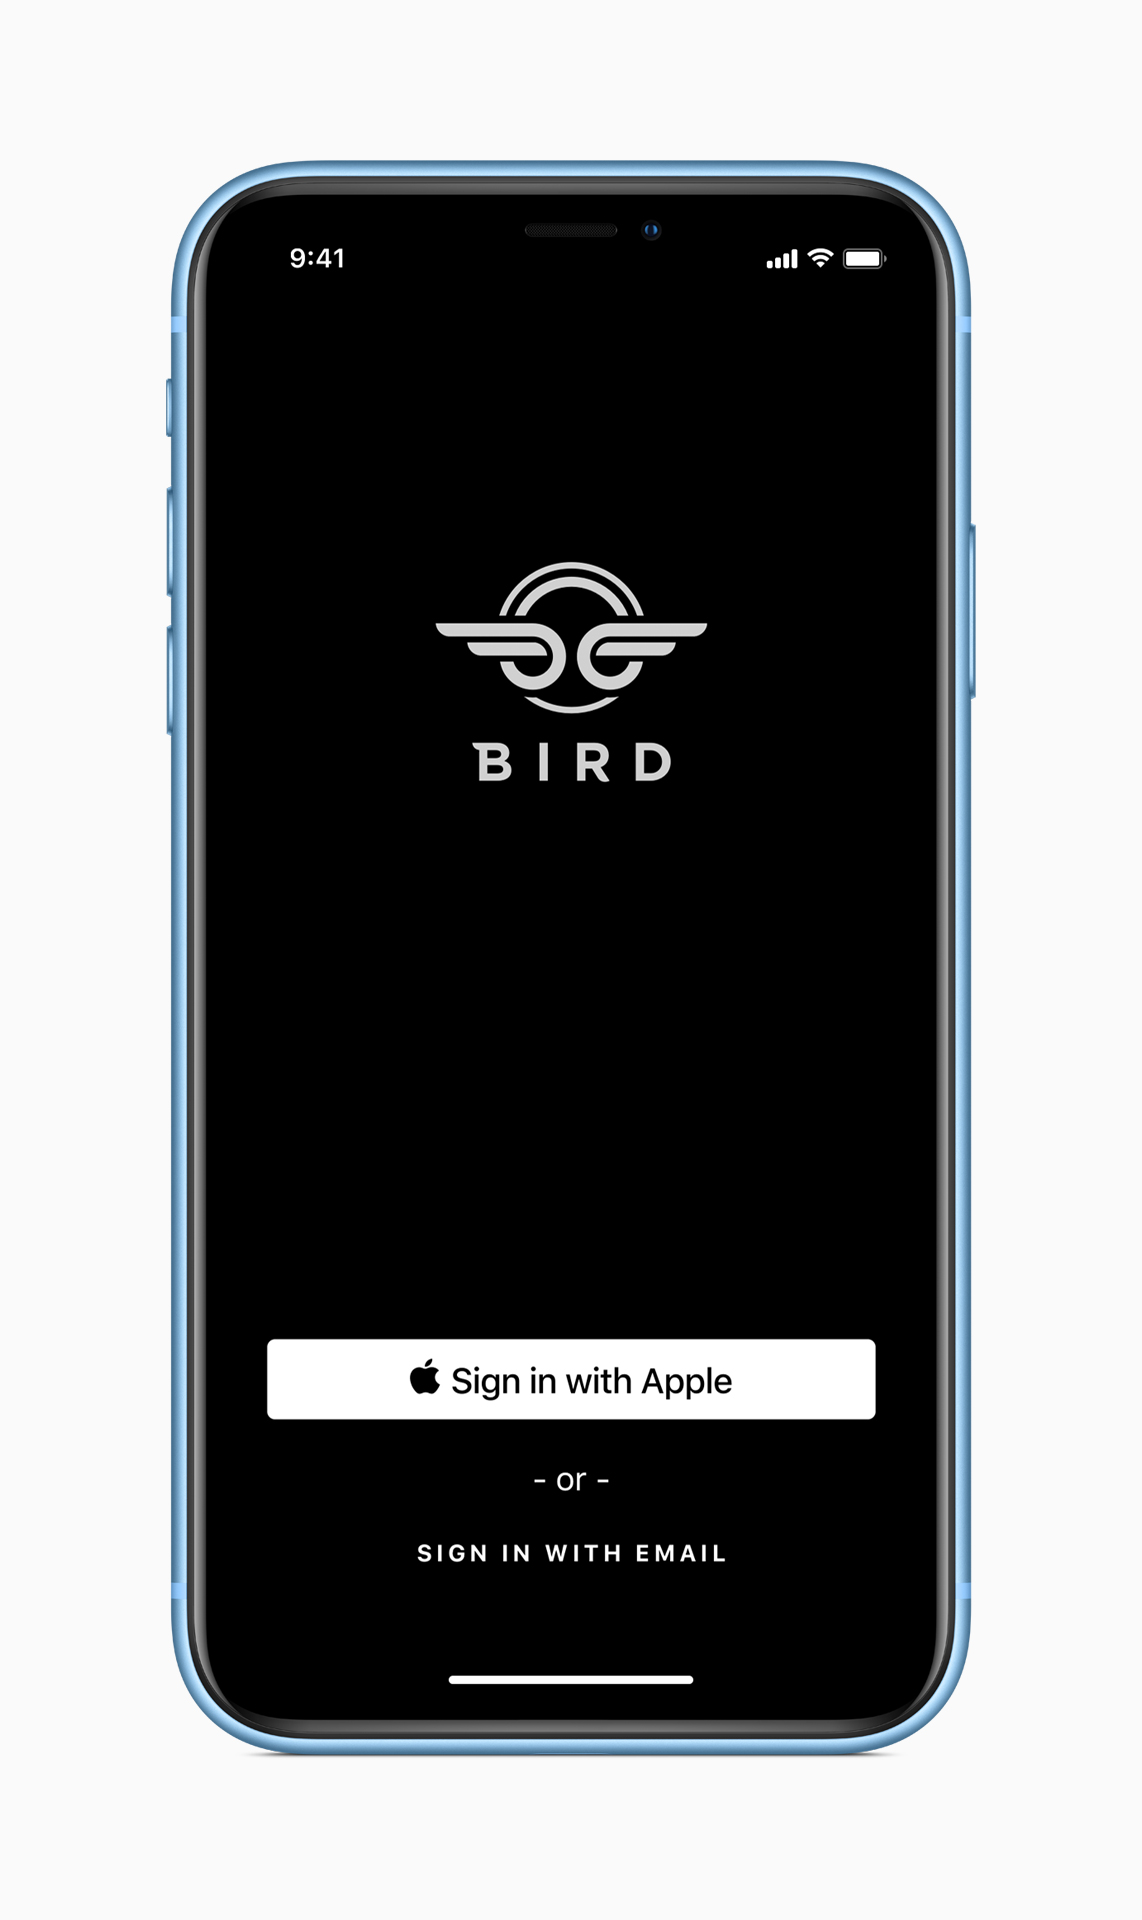 Apple-ios-13-sign-in-screen-iphone-xs-06032019